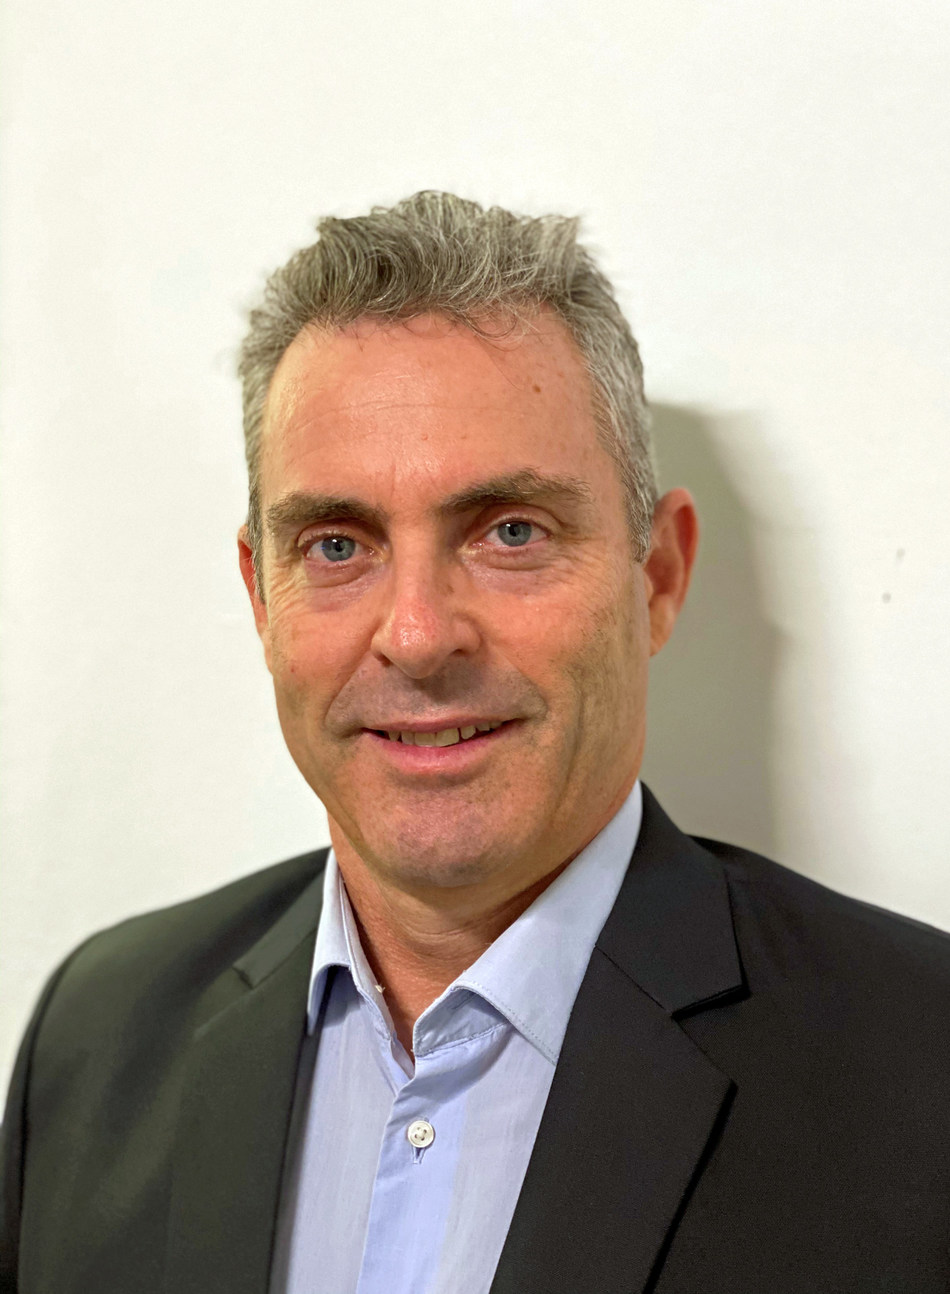 Tzemah Kislev, Vice President of Engineering, StoreDot